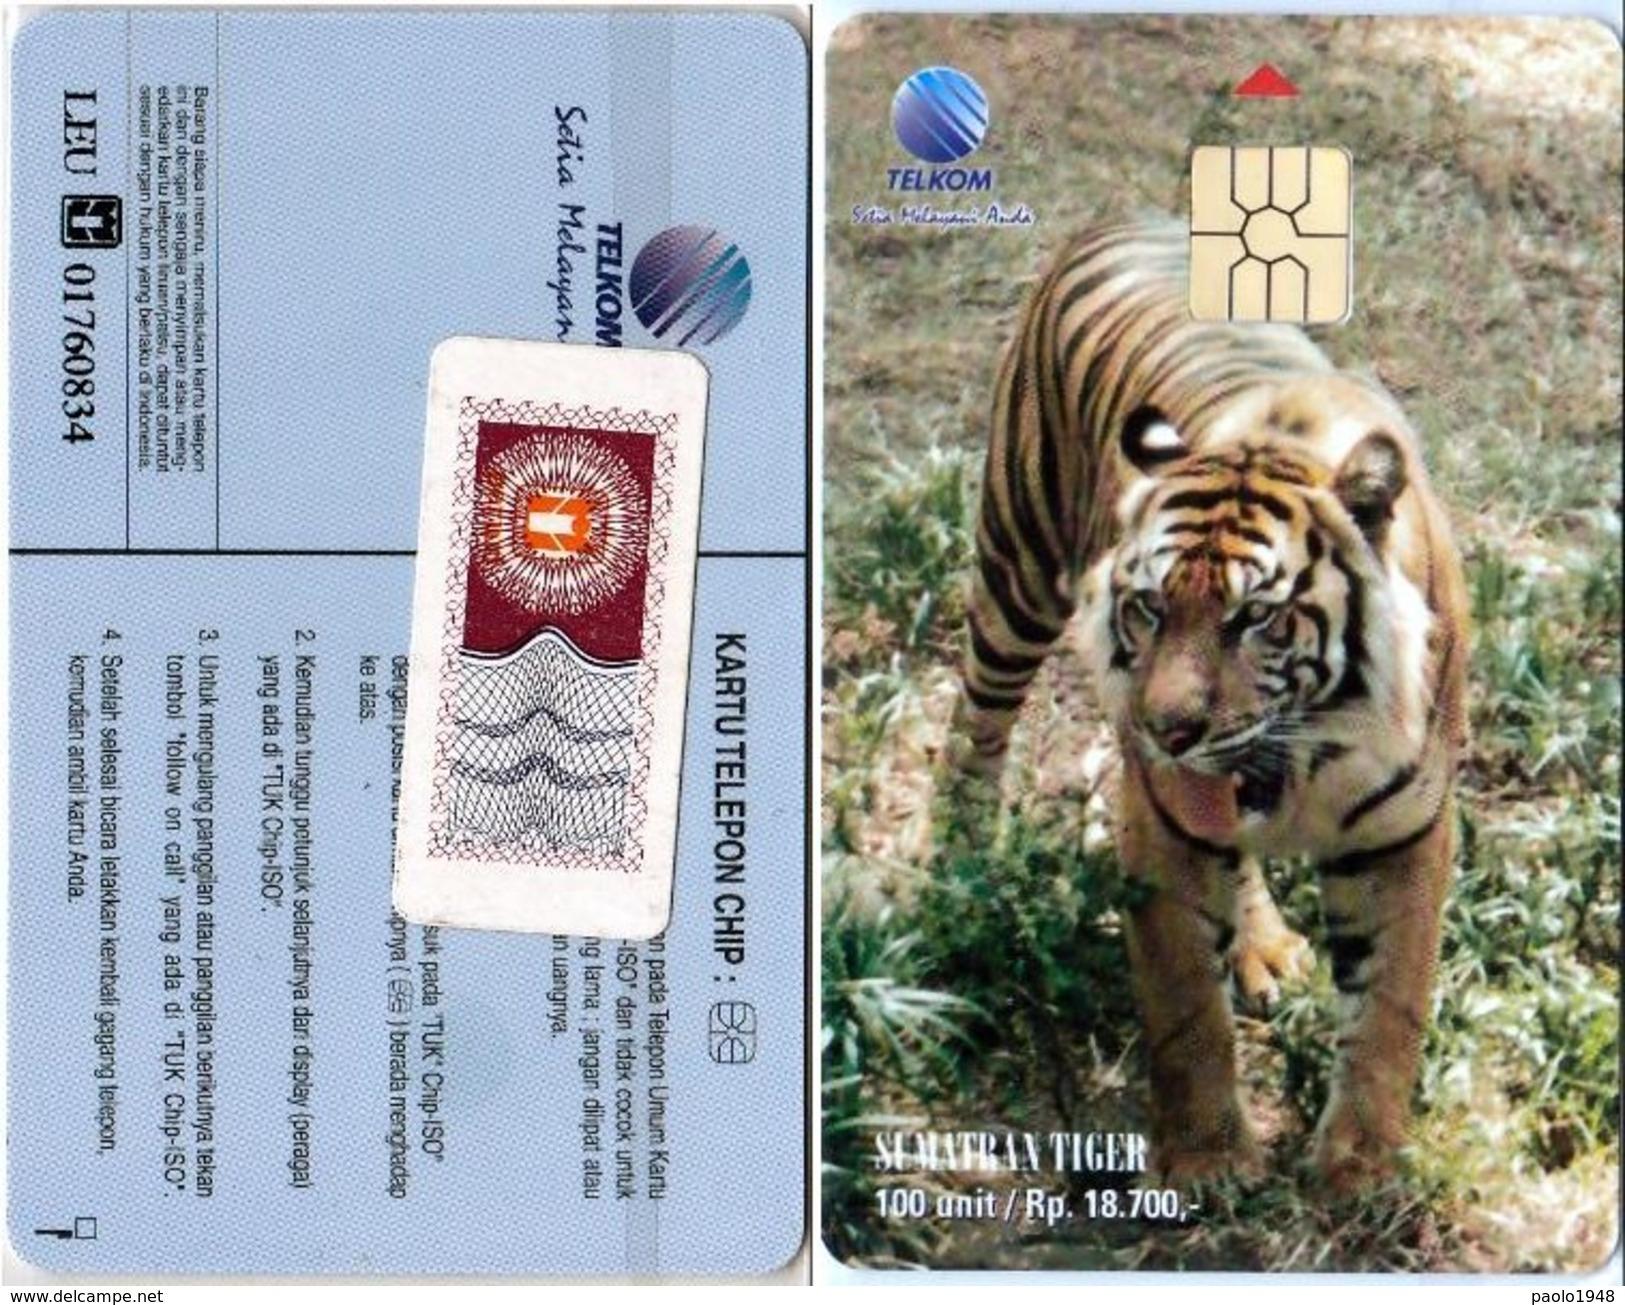 INDONESIA INDONESIEN - SS 65 Sumatran Tigers  - Mint With Original Blister- RRR - Indonesia